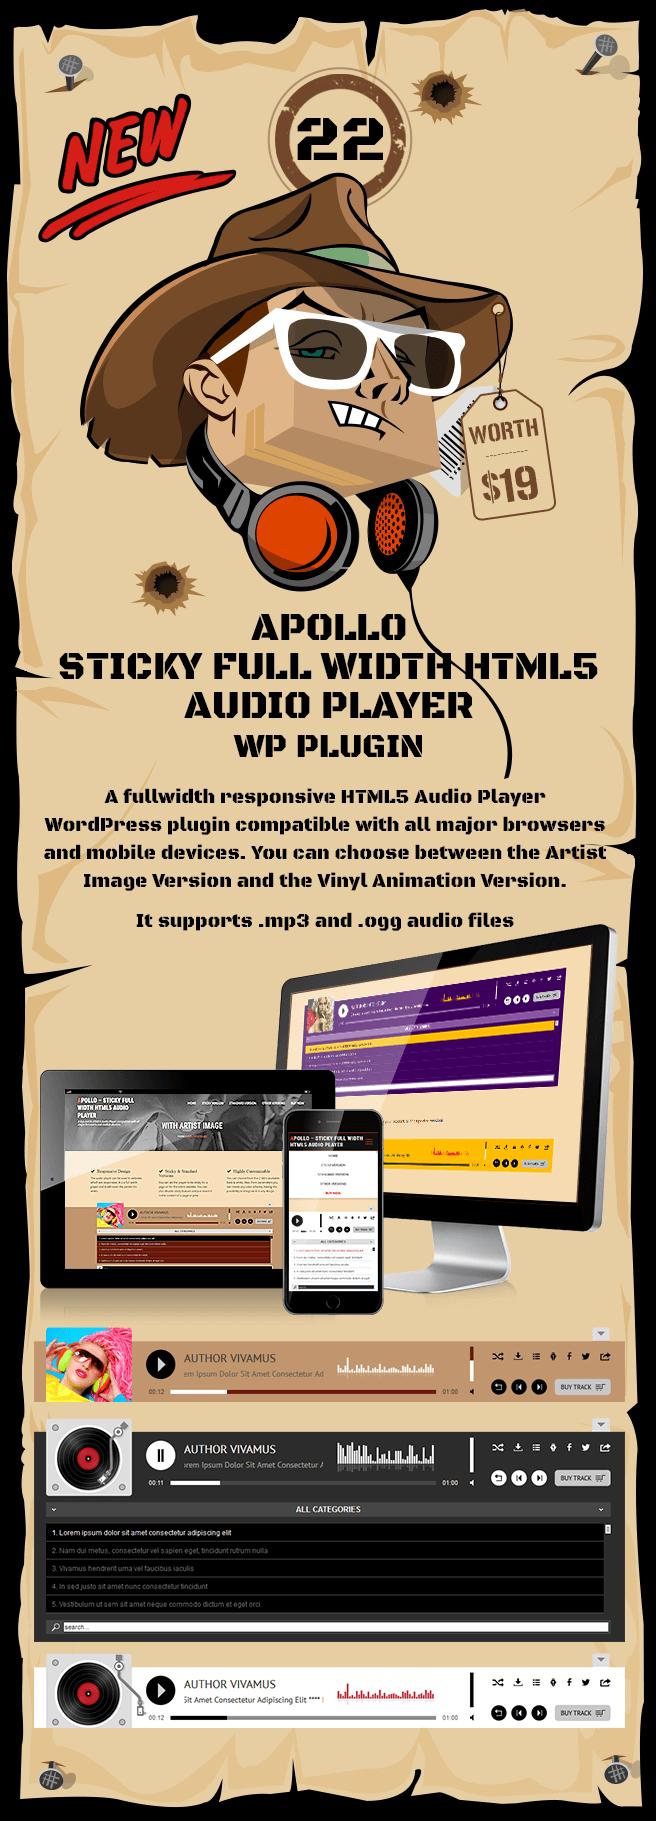 Apollo – Sticky Full Width HTML5 Audio Player WordPress Plugin